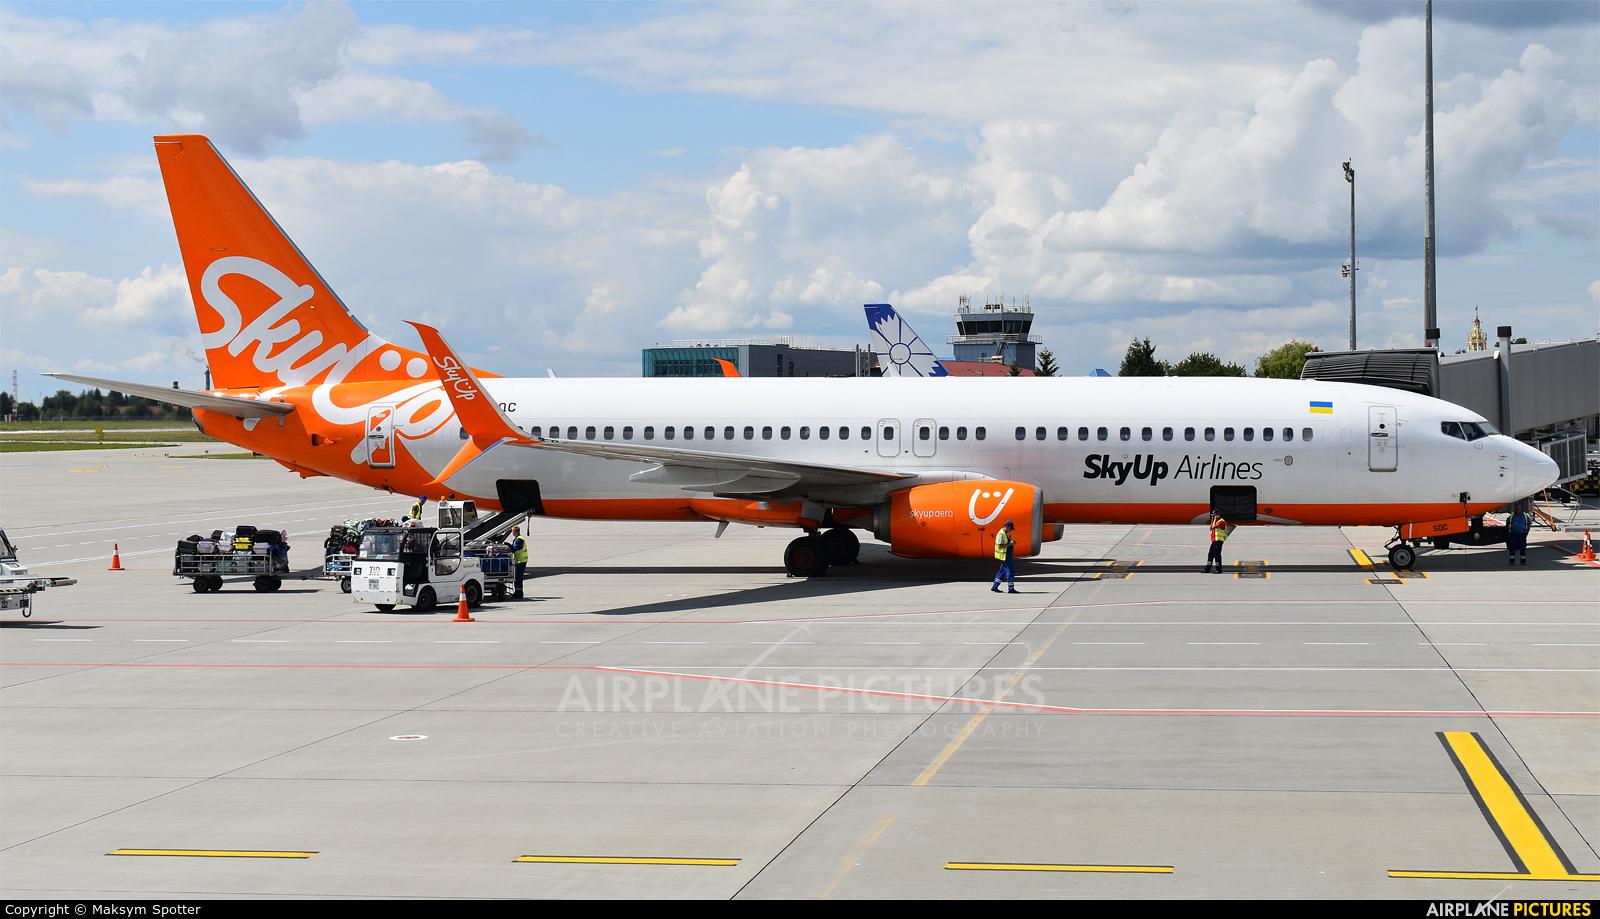 SkyUp Airlines UR-SQC aircraft at Lviv Danylo Halytskyi International Airport (Lwów Skniłów)